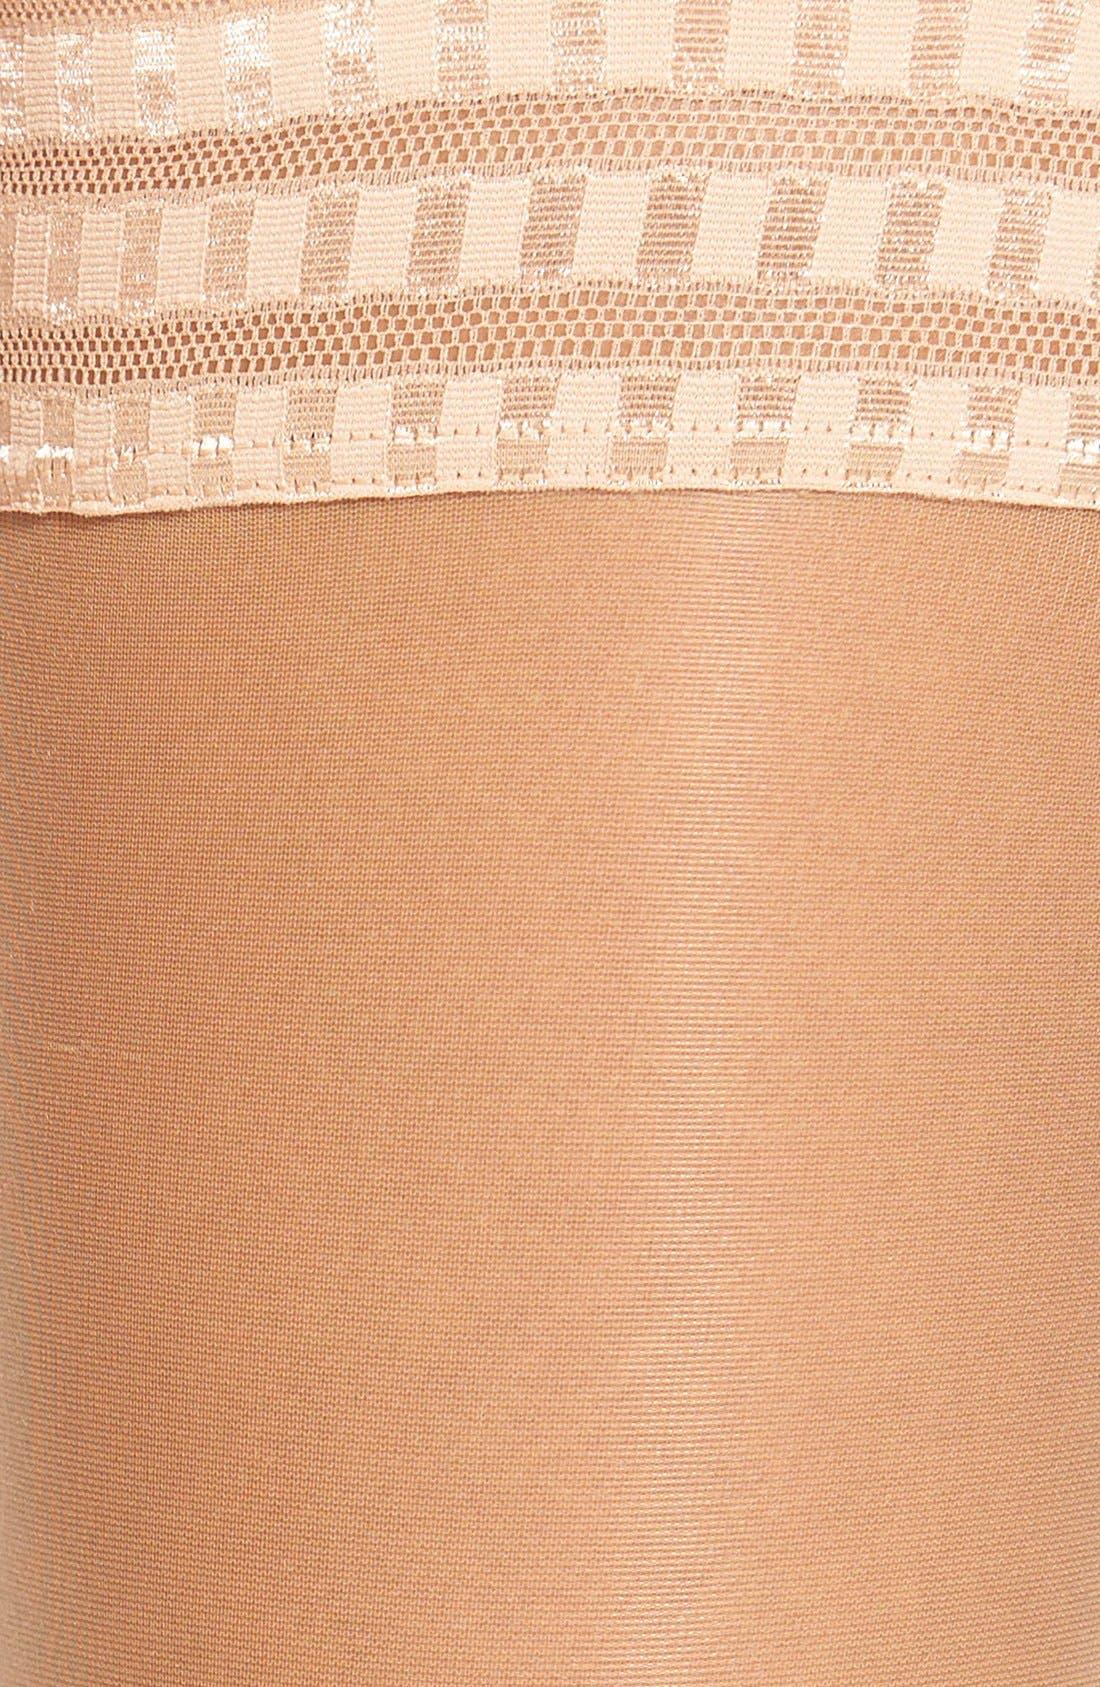 'Pure Matt 20' Stay-Up Stockings,                             Alternate thumbnail 16, color,